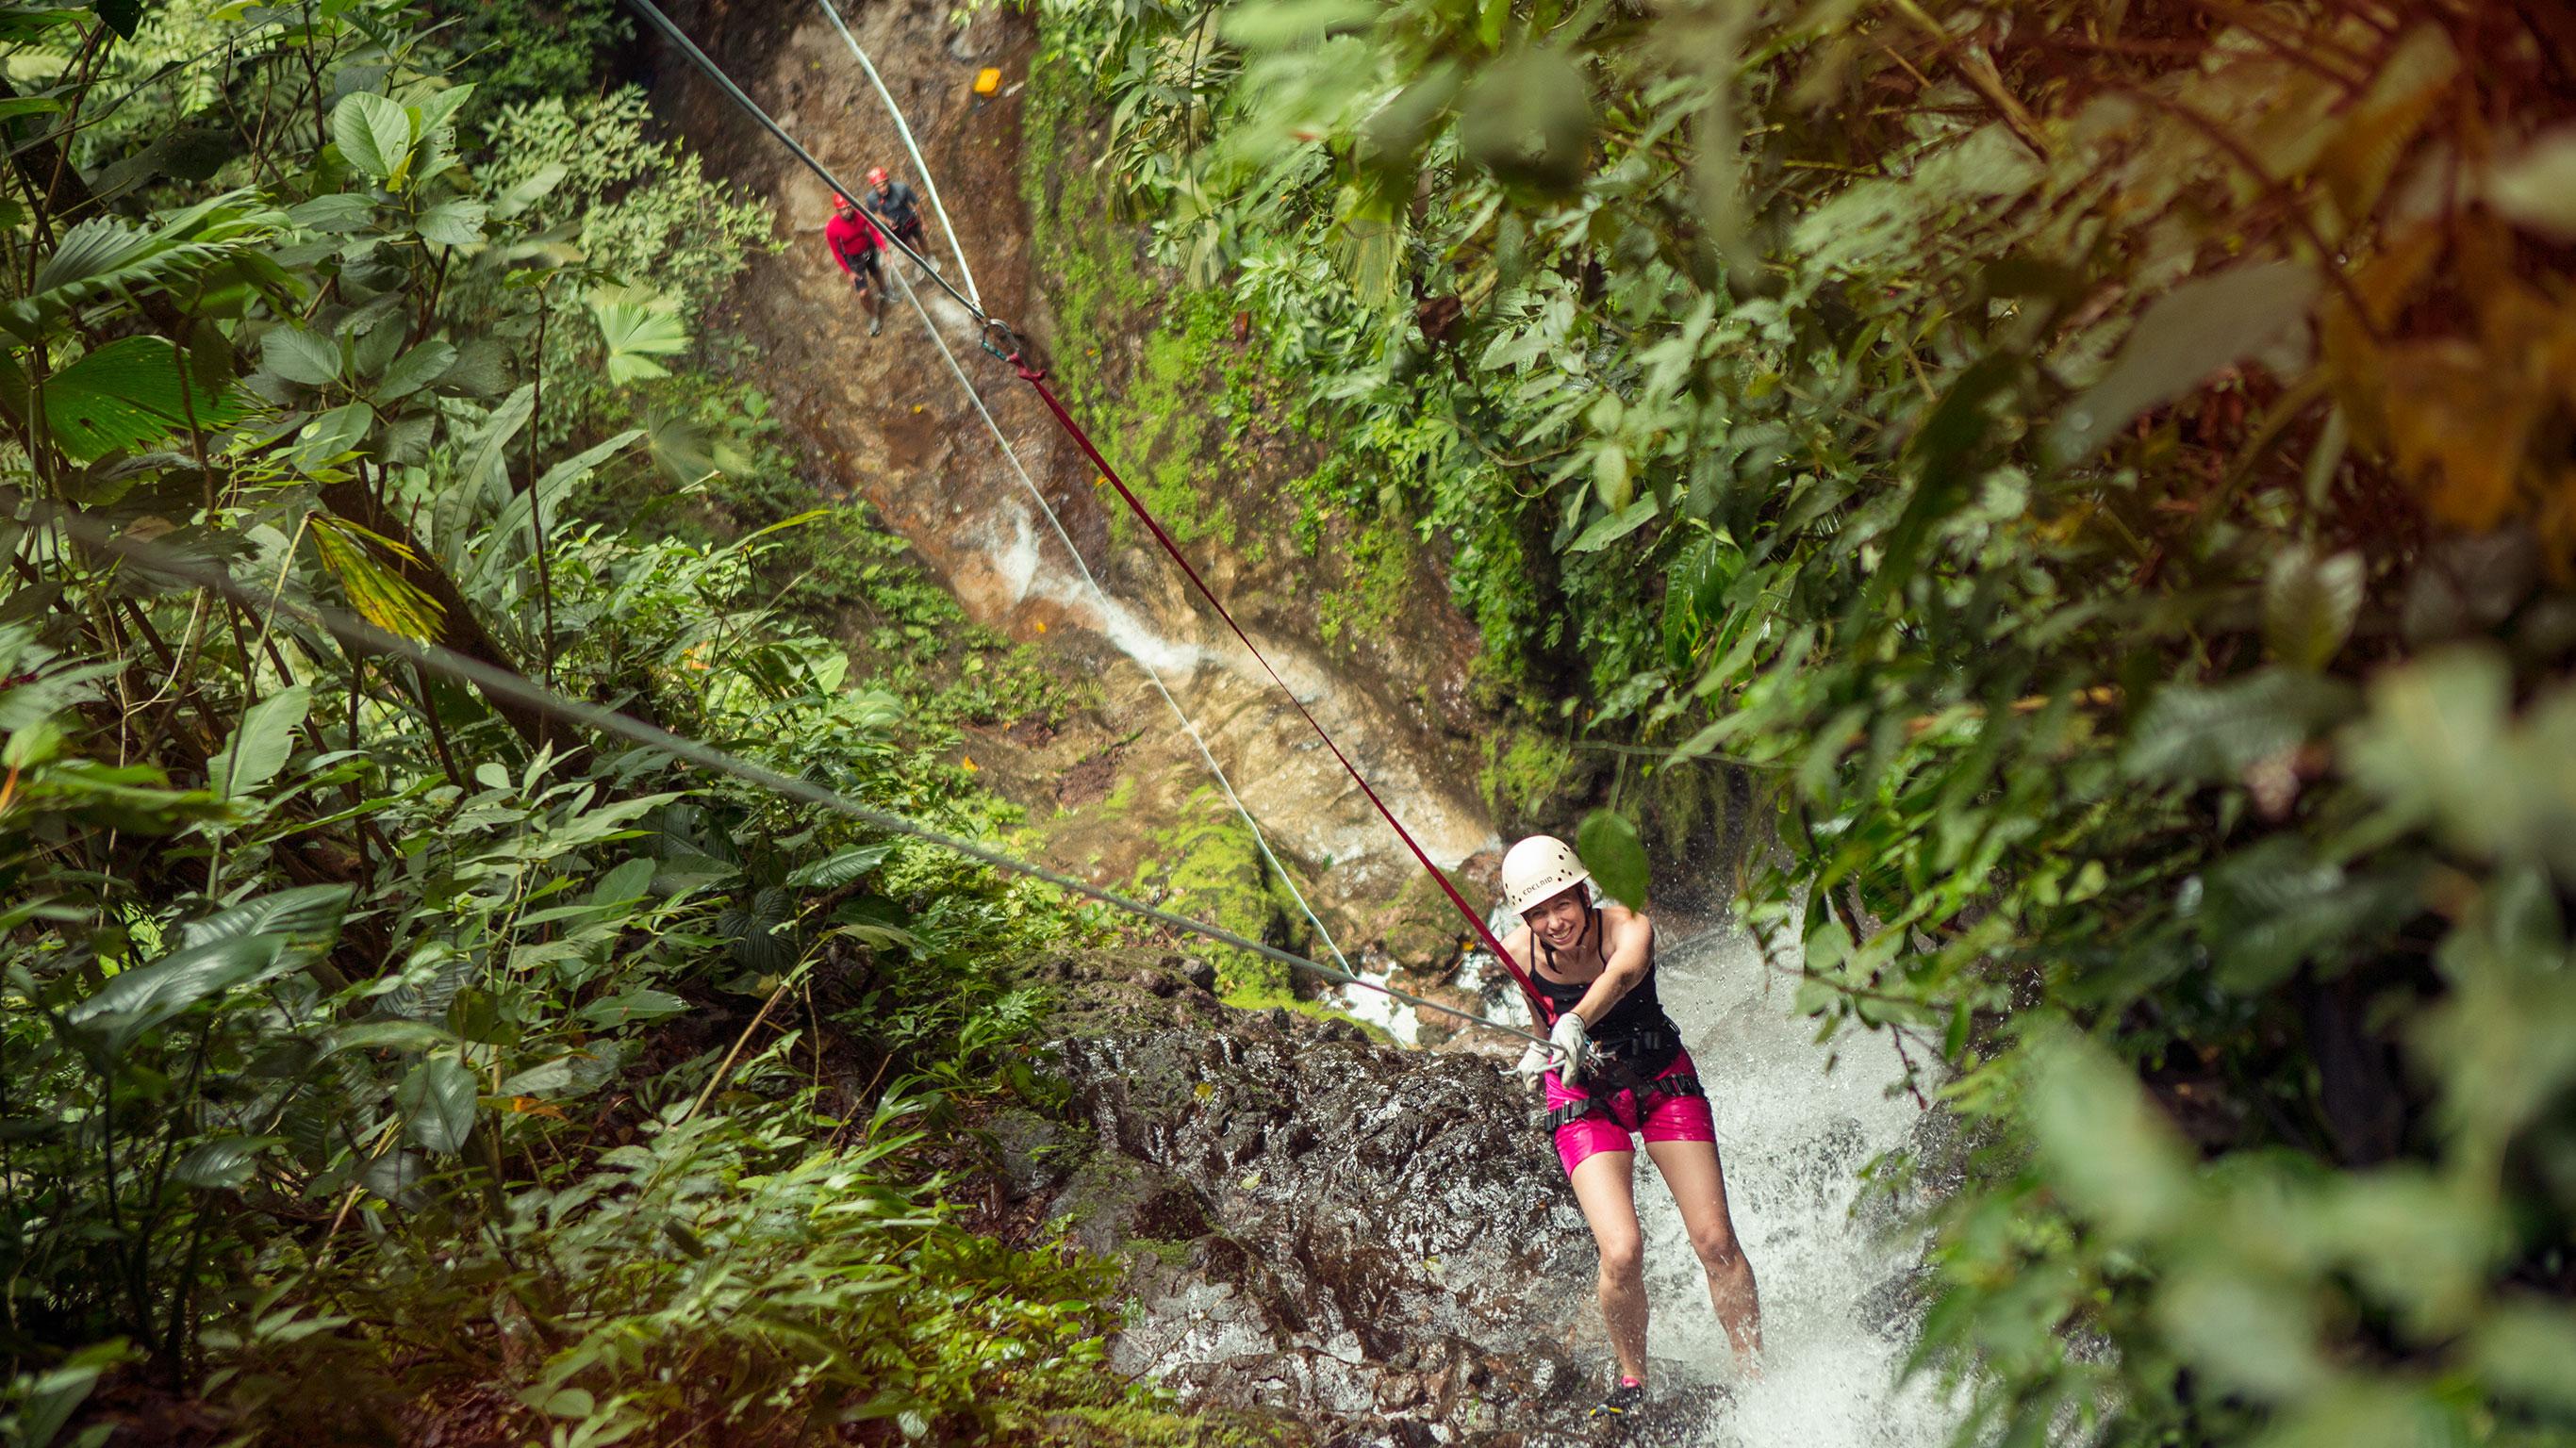 costa-rica-quest-teenage-adventure